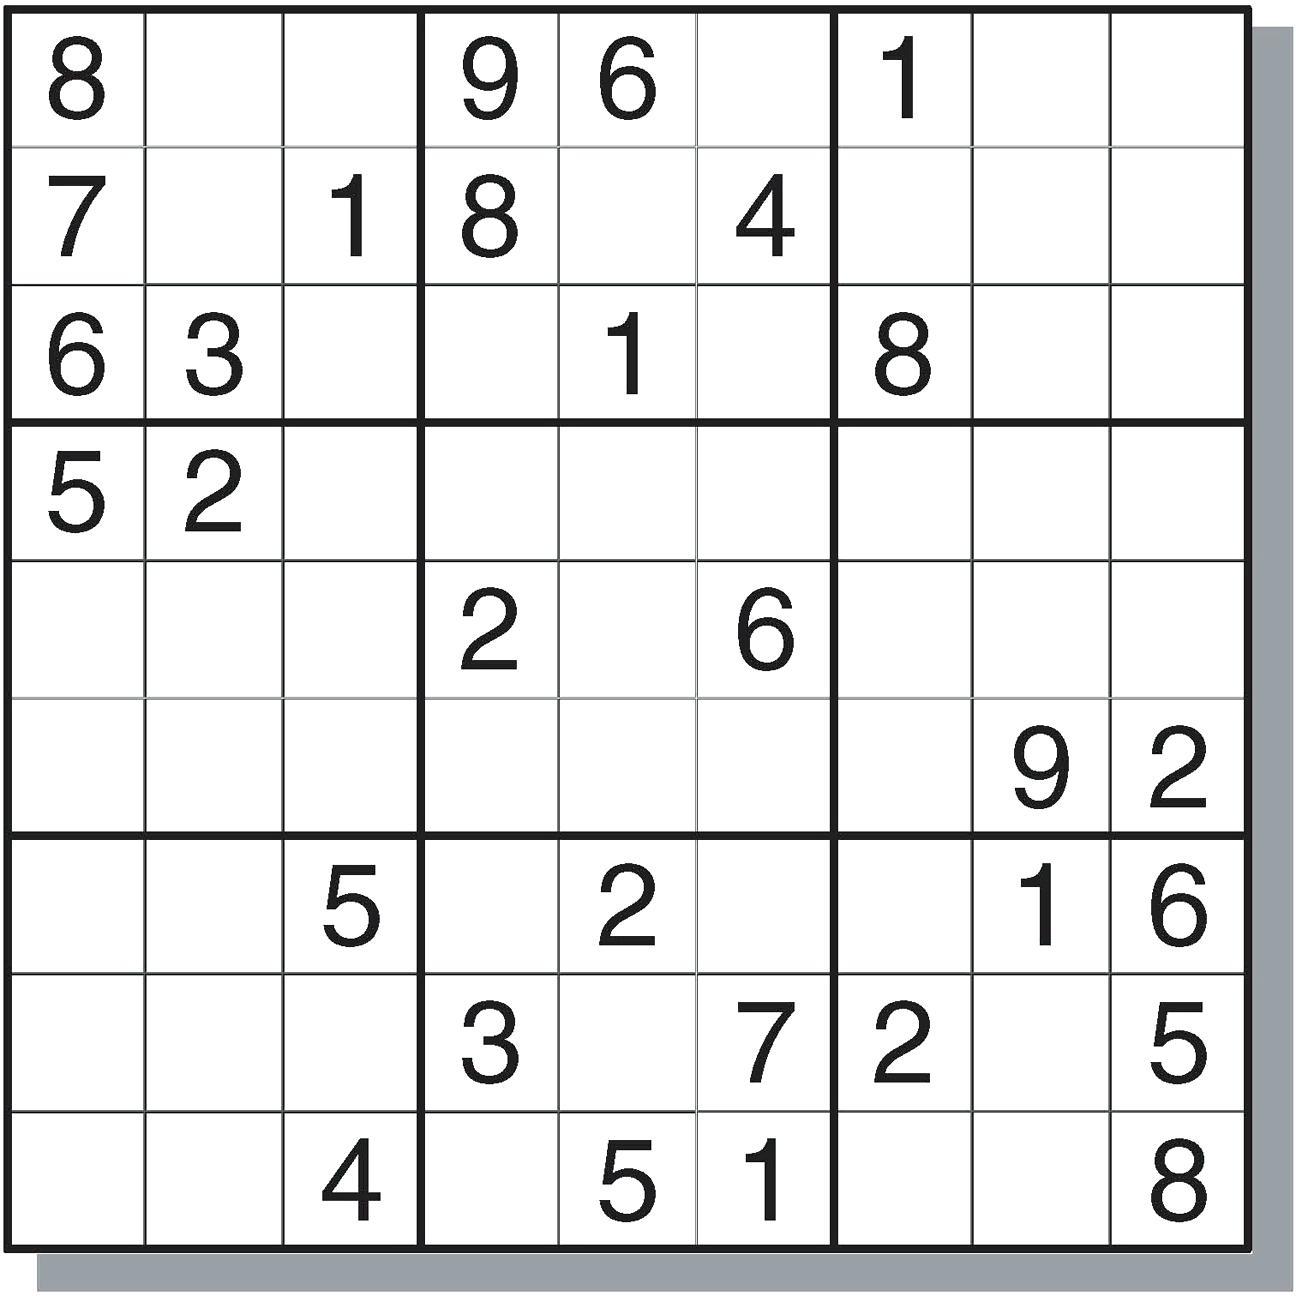 Worksheet : Easy Sudoku Puzzles Printable Flvipymy Screenshoot On - Printable Sudoku Puzzles Uk